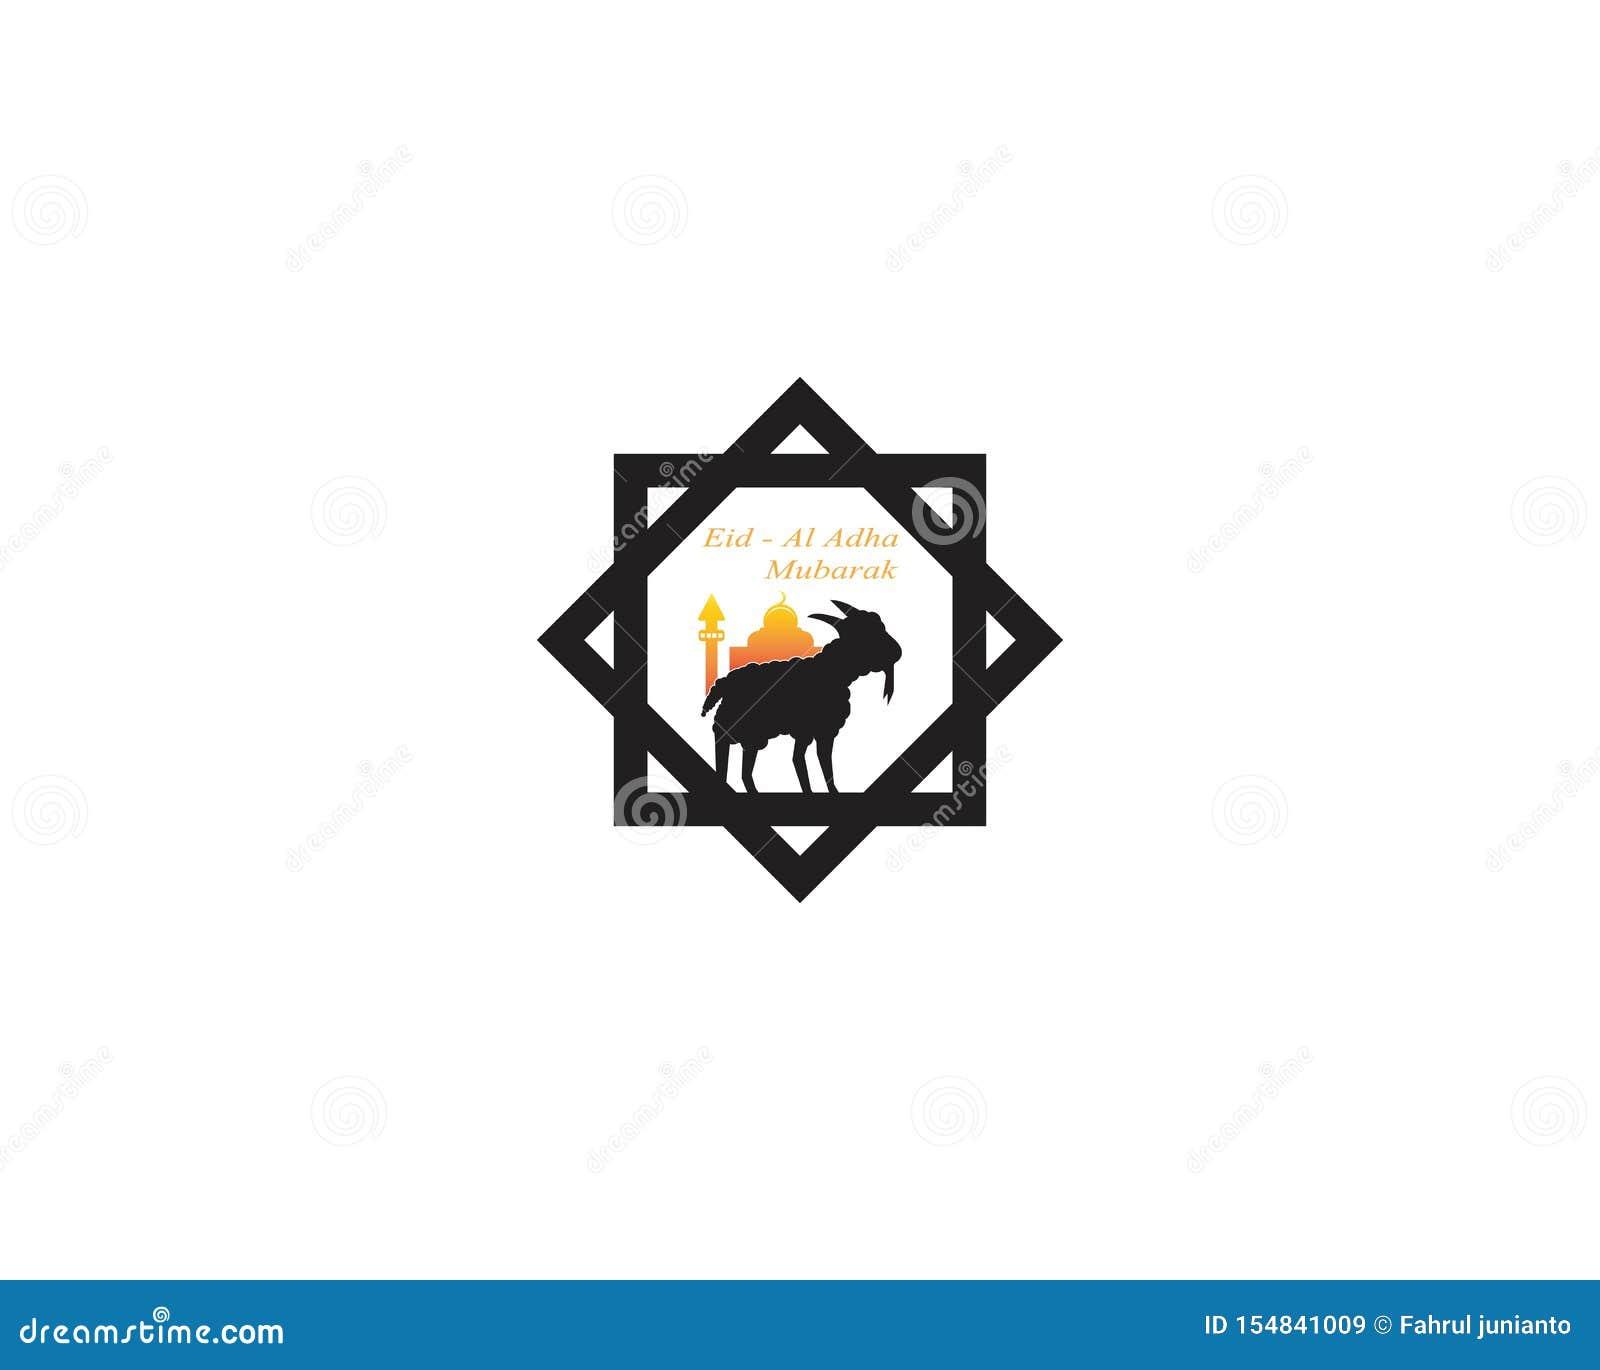 eid al adha mubarak logo vector illustration stock vector illustration of decoration goat 154841009 https www dreamstime com eid al adha mubarak logo vector illustration mosque banner arabic muslim ornament saudi celebration fitr card light festival image154841009